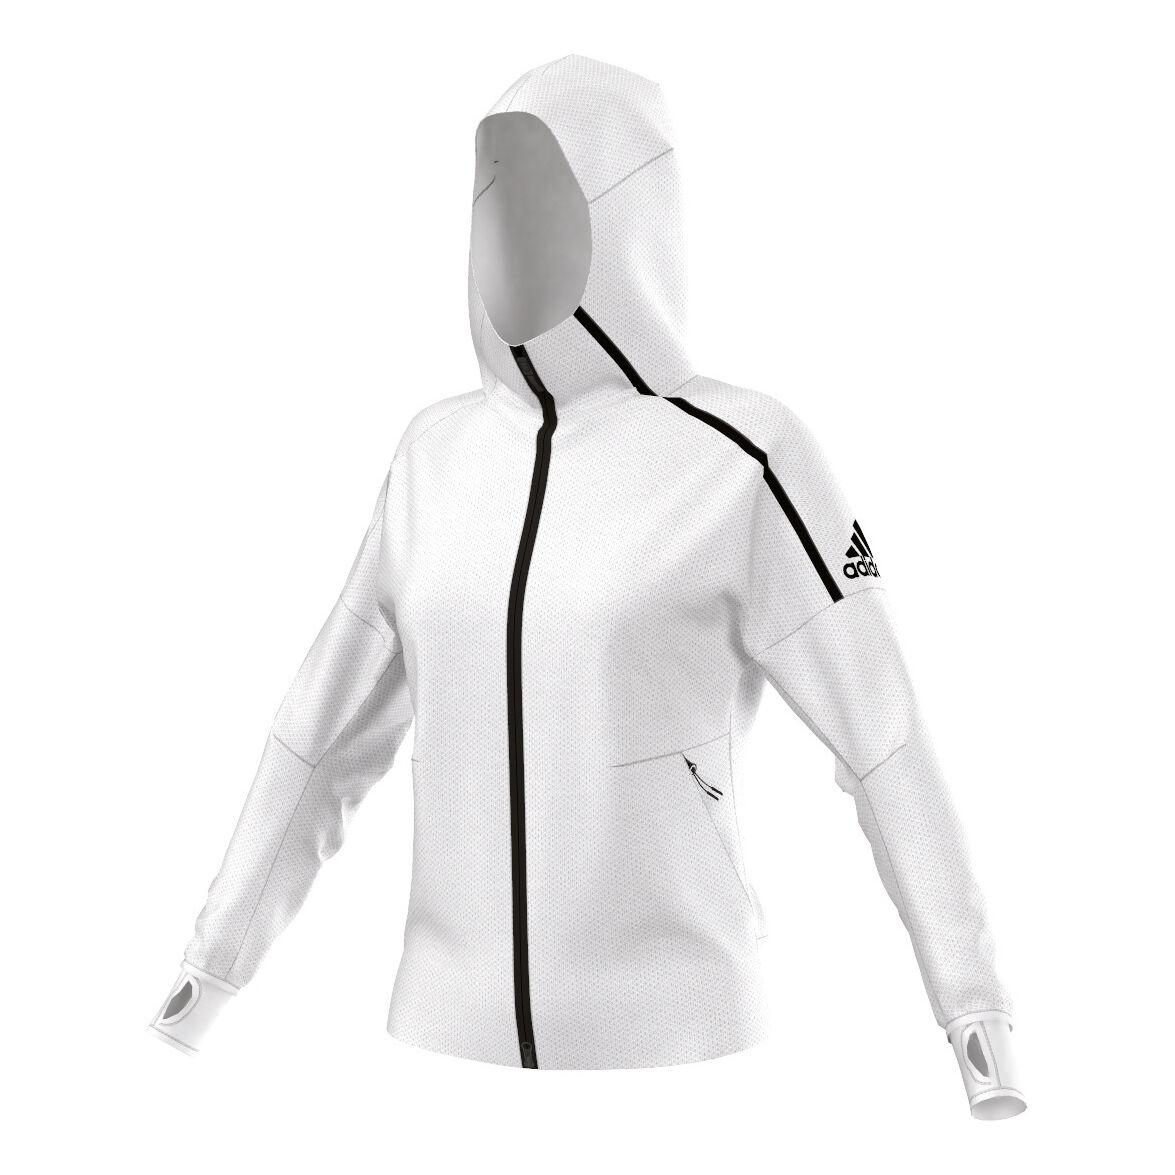 adidas ZNE Laufjacke Damen Weiß online kaufen | Jogging Point